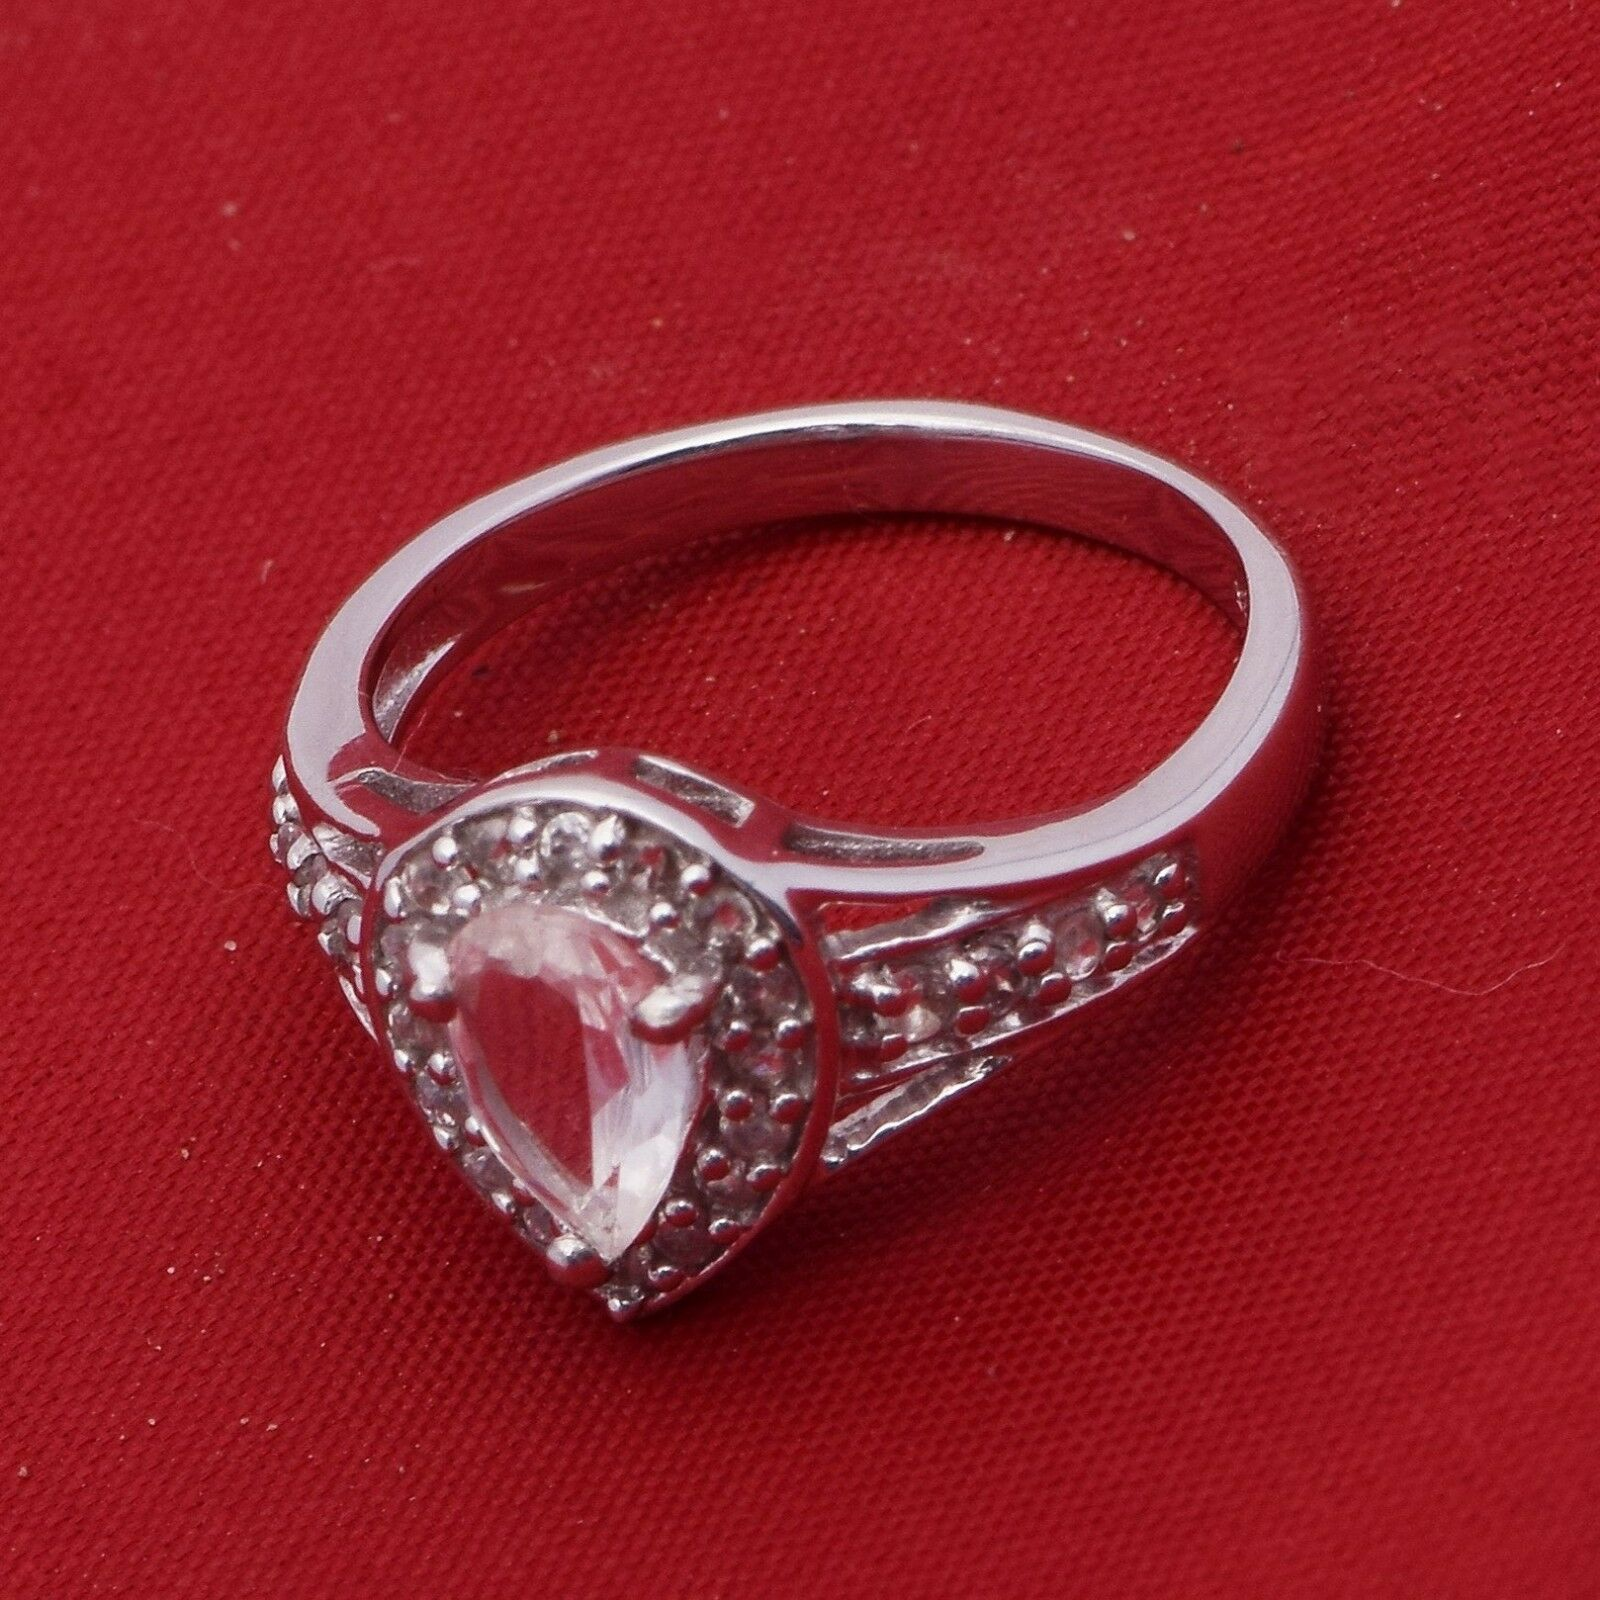 Pear Shape White Topaz Stone Solitaire Split Shank Wedding Halo Ring 925 Silver